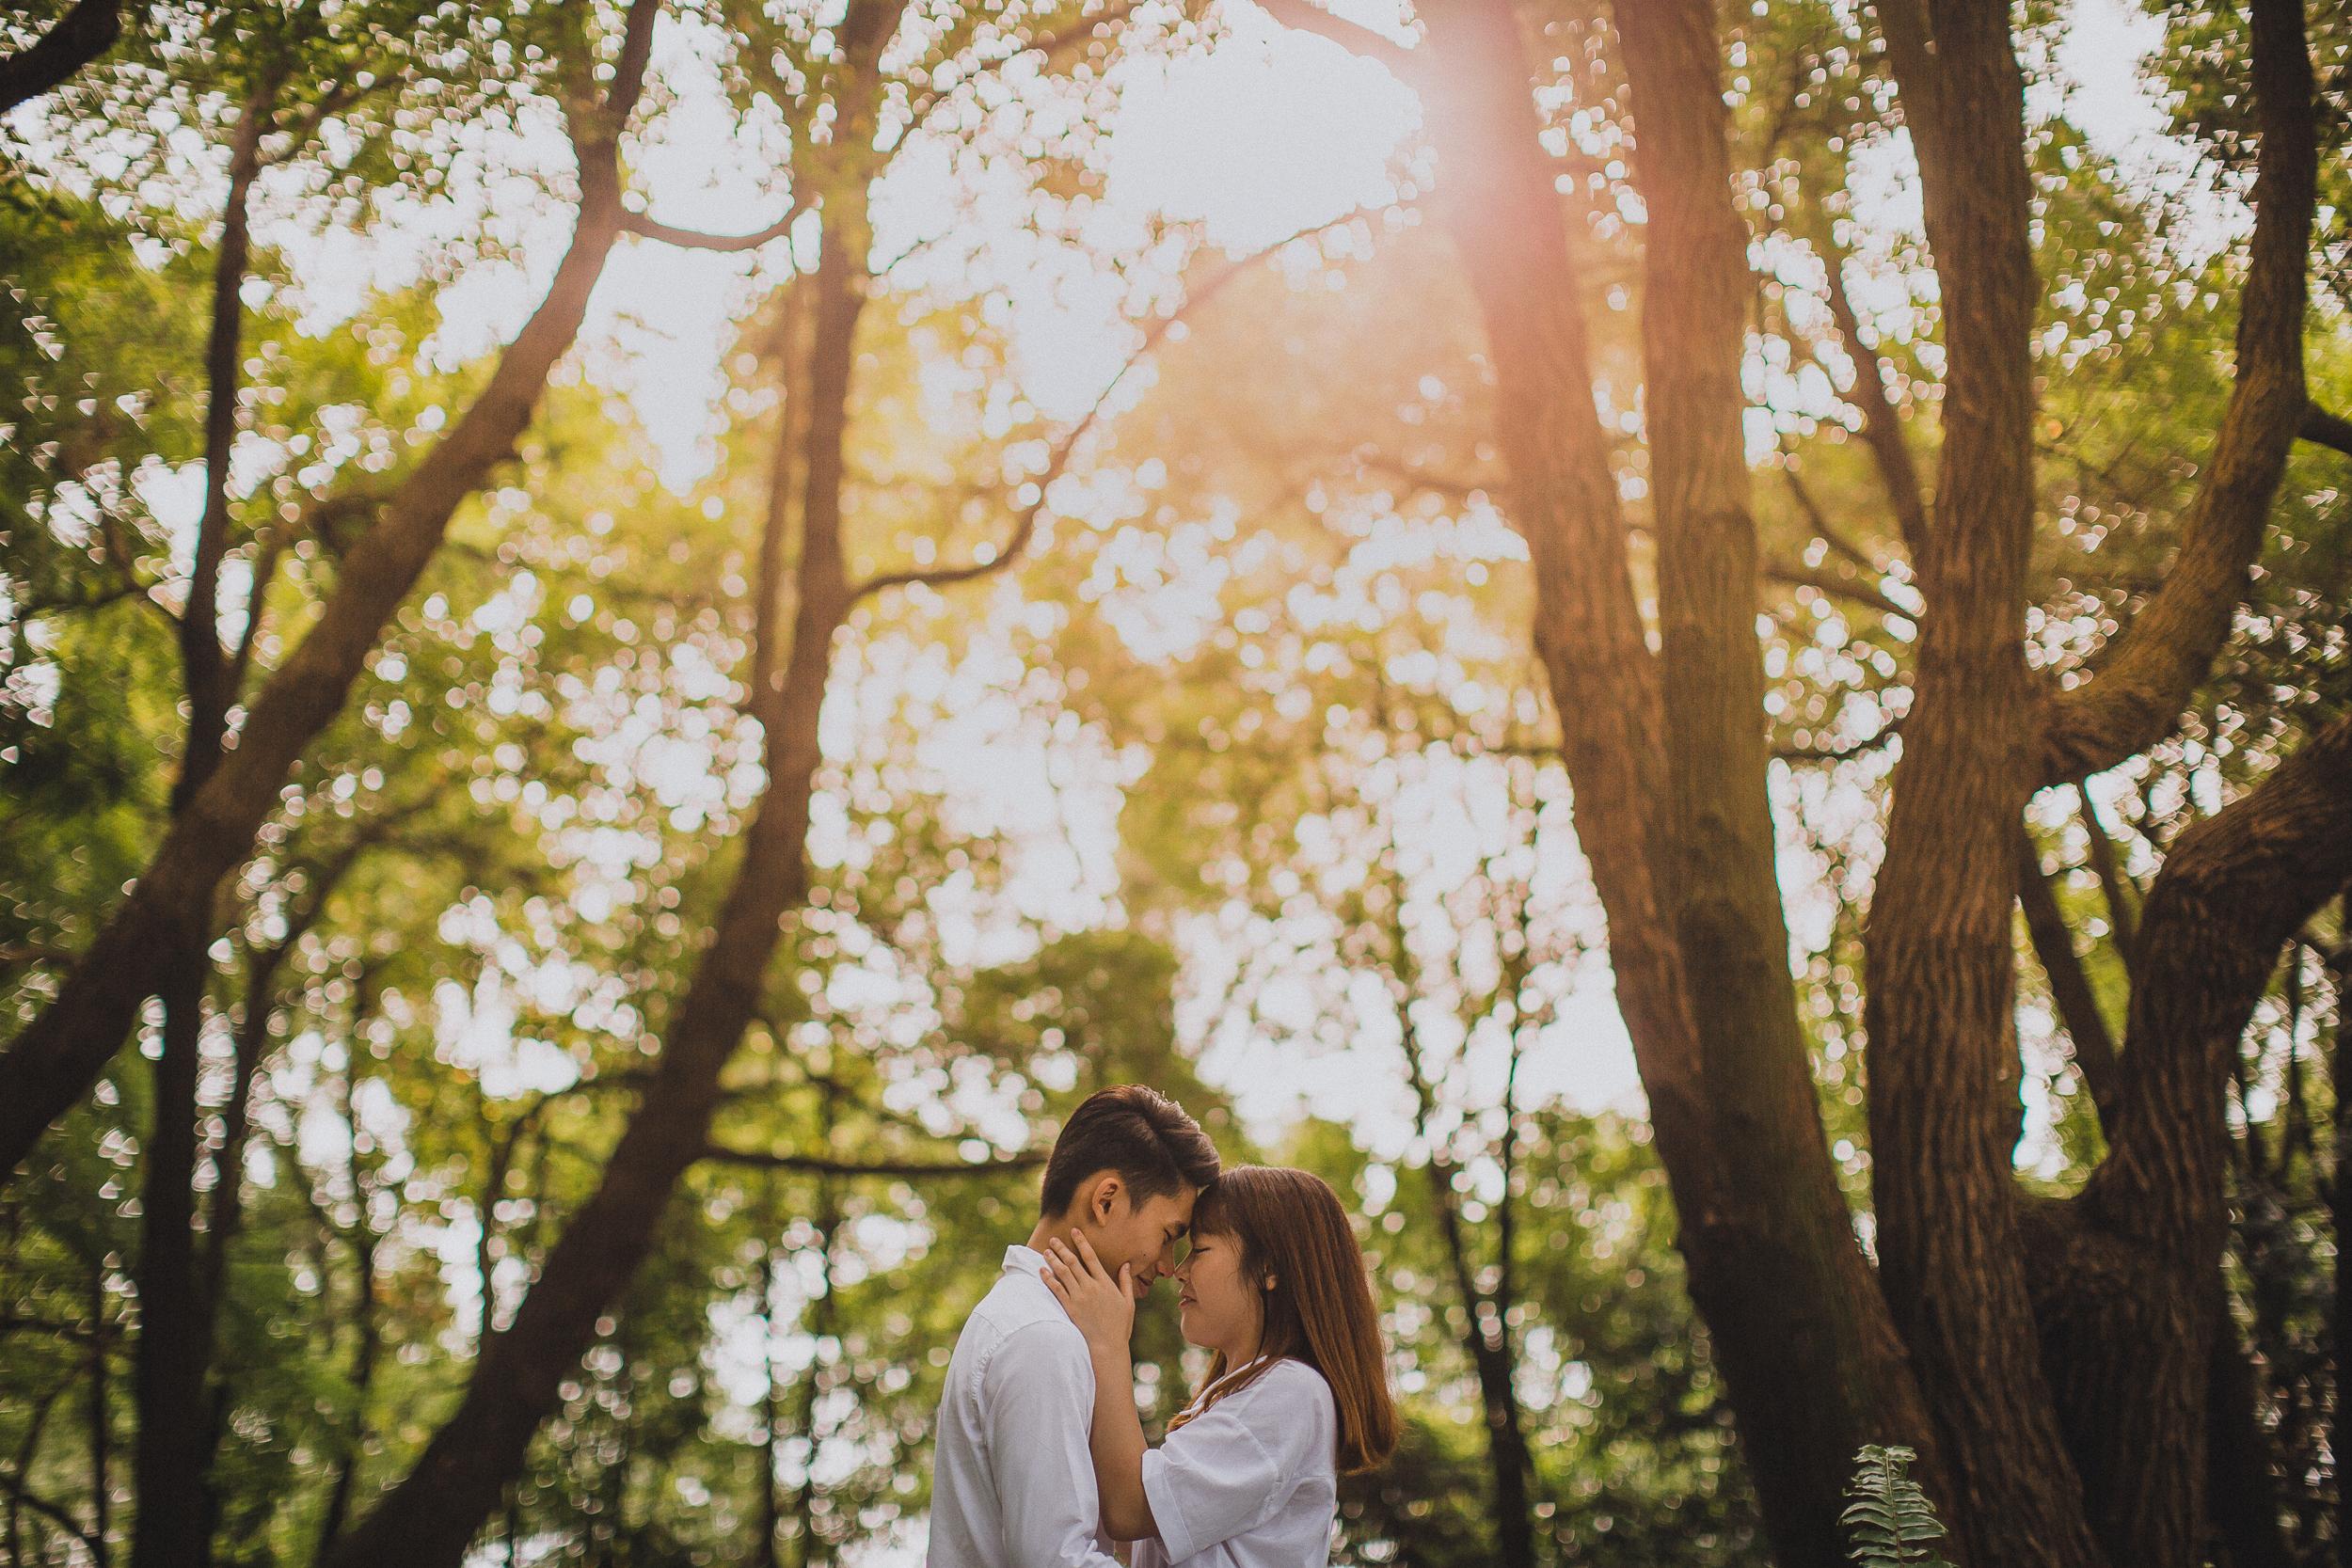 Singapore+Wedding+Photographer+Pre-Wedding+Couple+Zhiyu+Huimin-0013.jpg